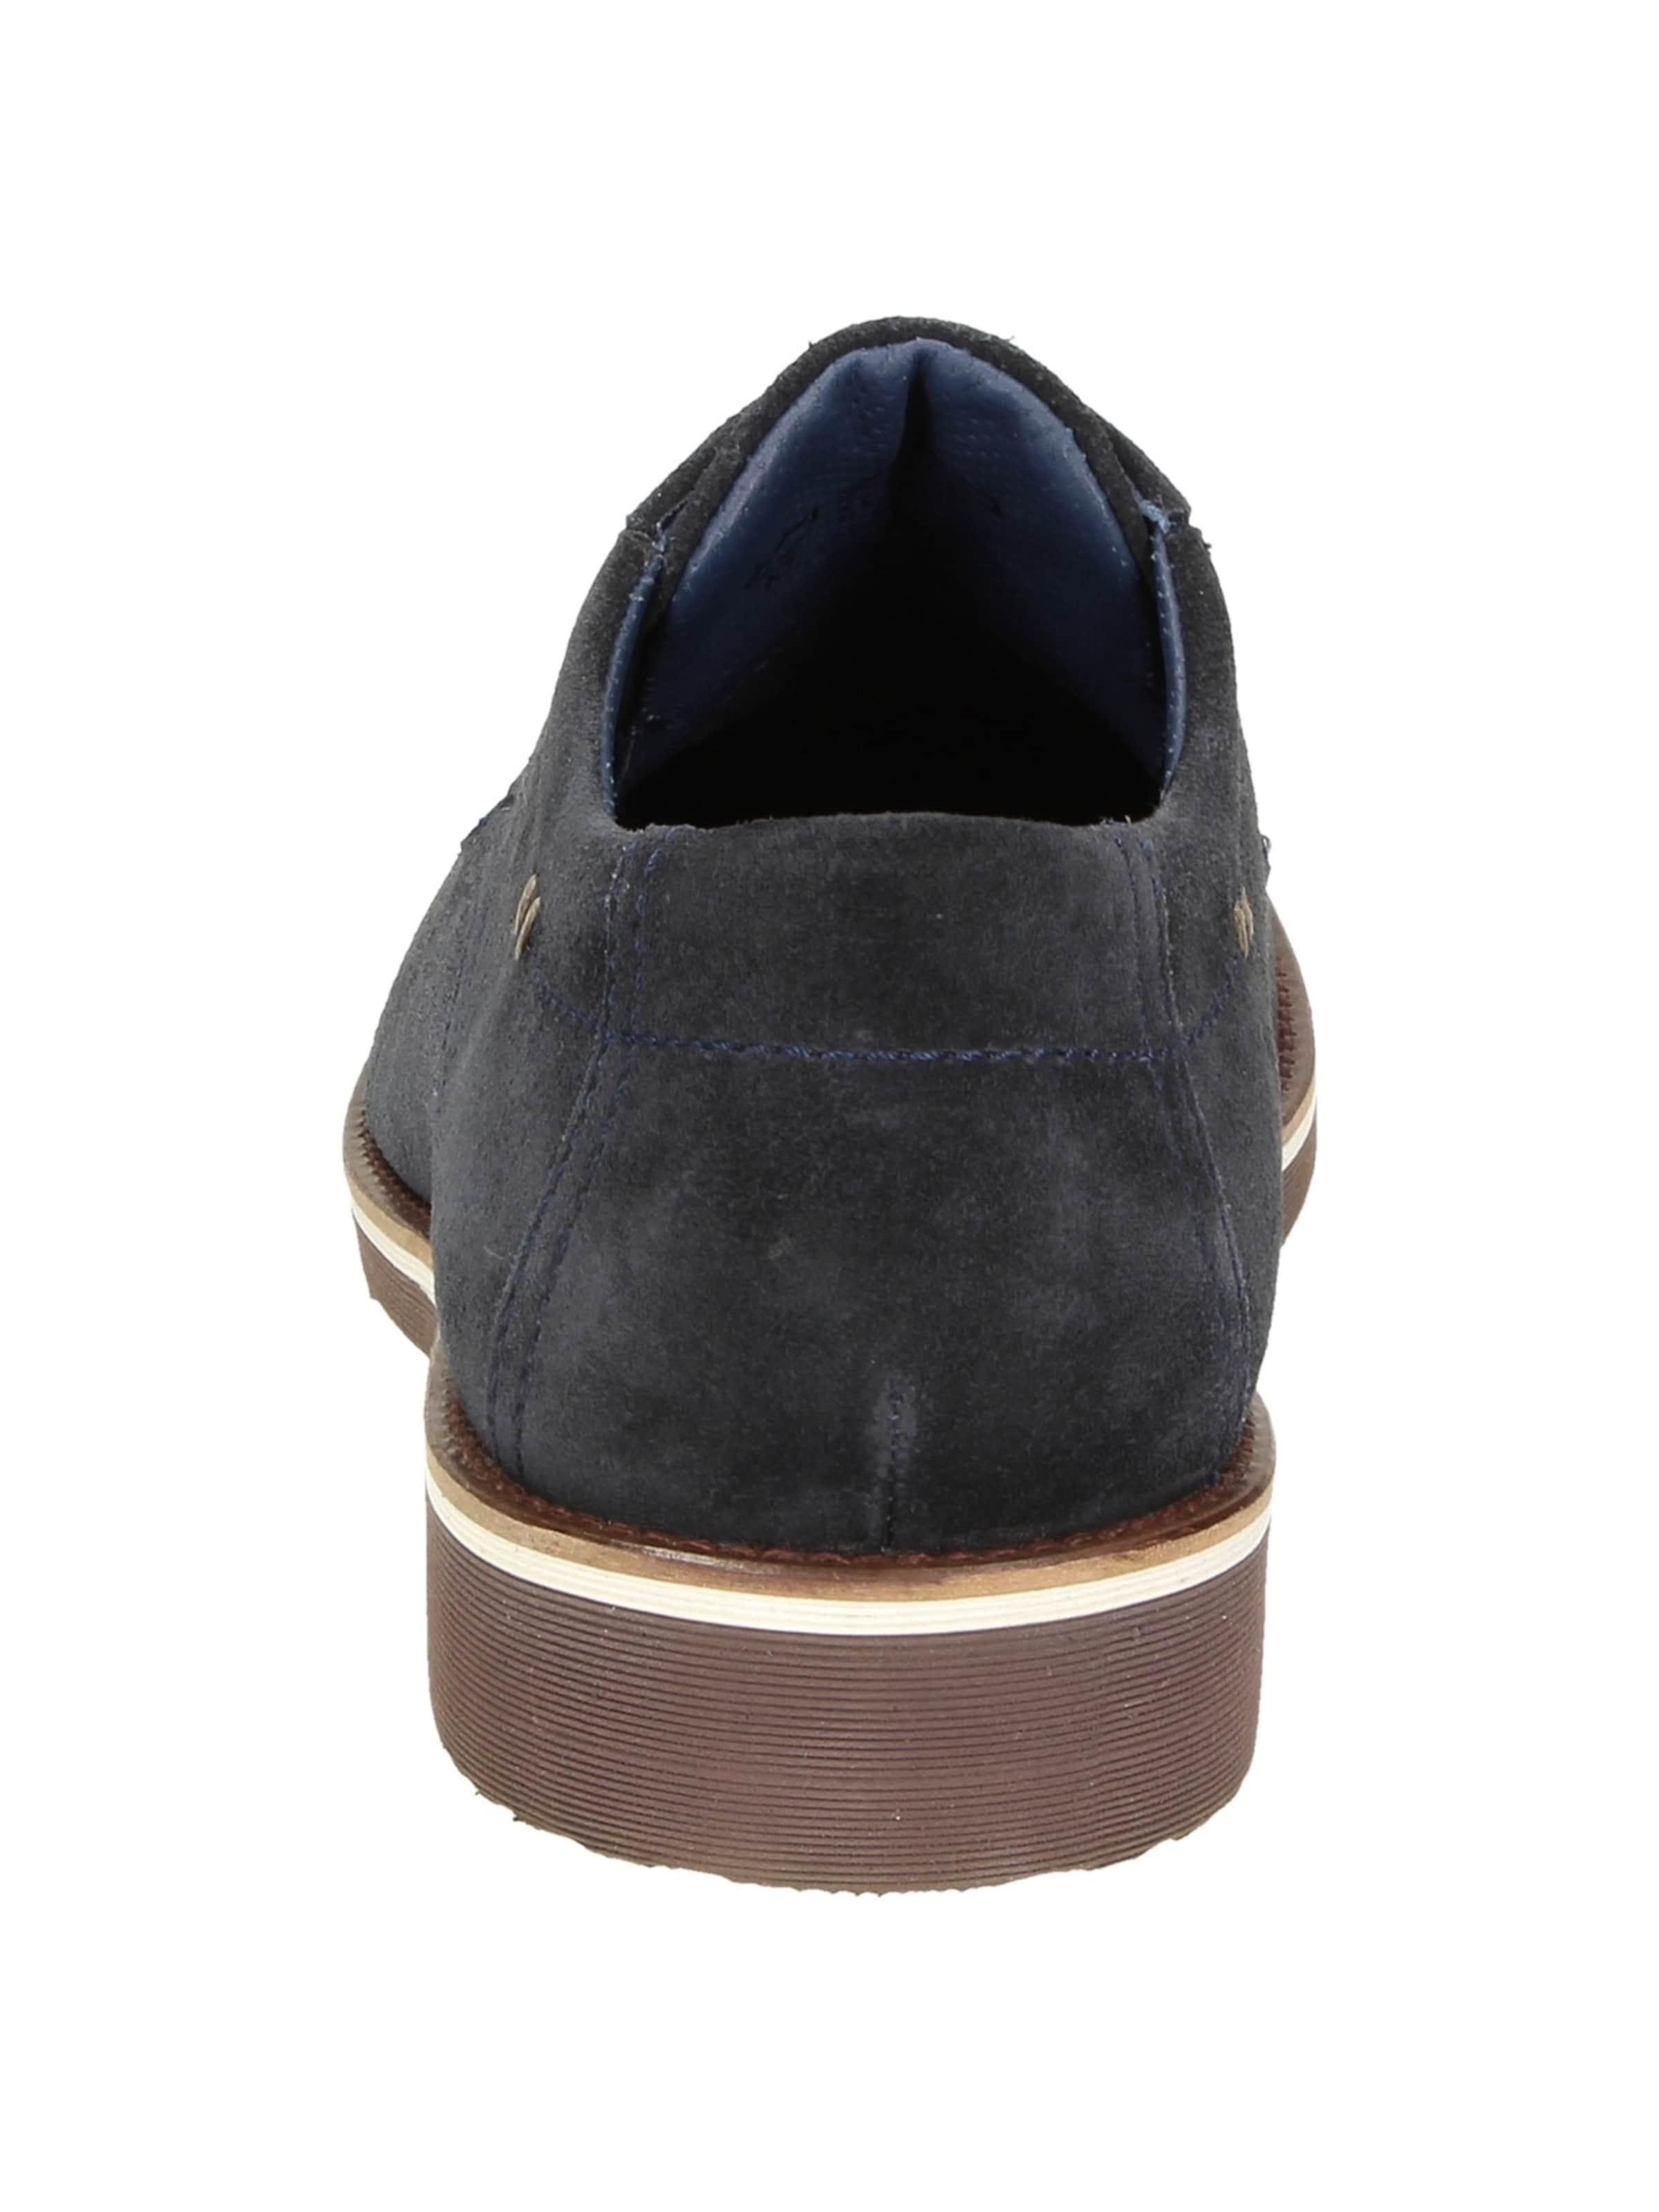 SIOUX Schnürschuh 'Dilip-702-XL Leder Bequem, Bequem, Bequem, gut aussehend 7eaccf